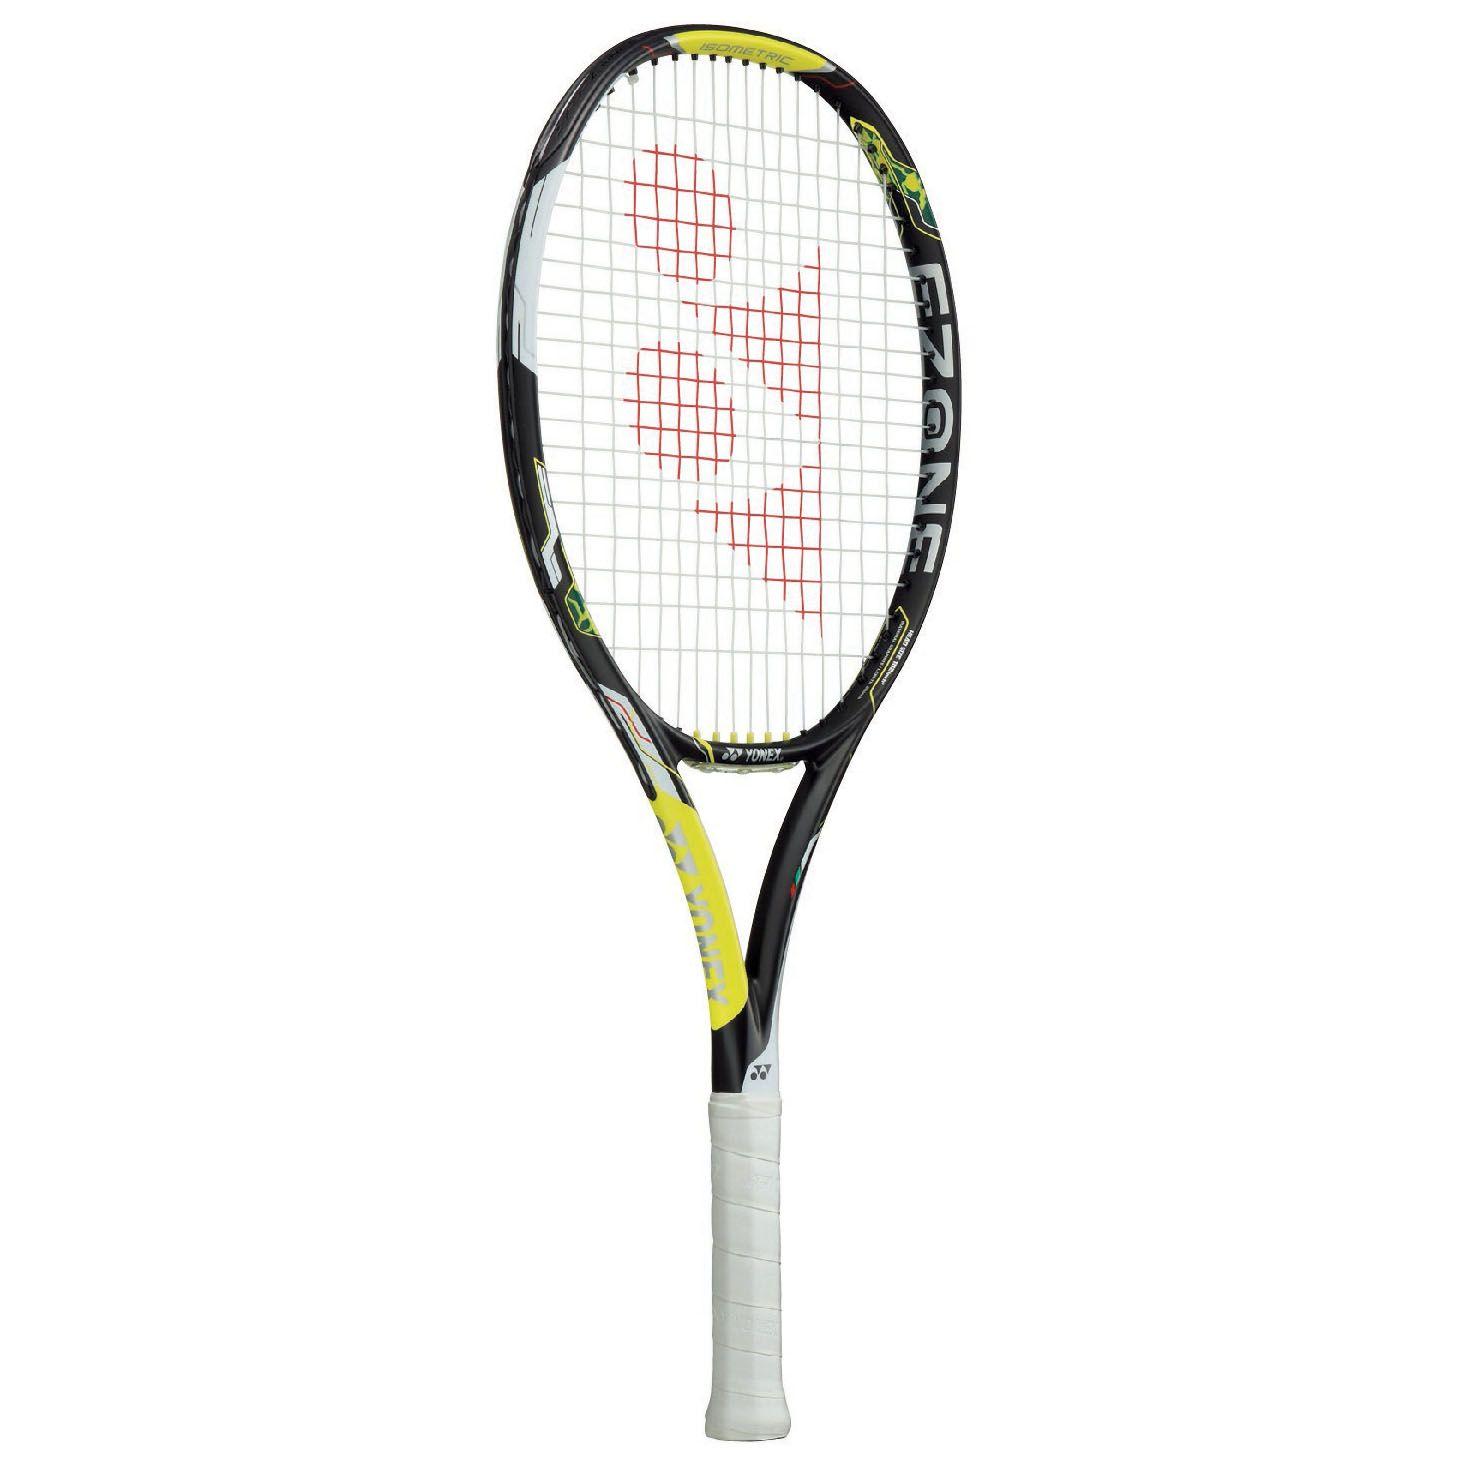 Yonex Ezone Ai 26 Junior Tennis Racket - Sweatband.com